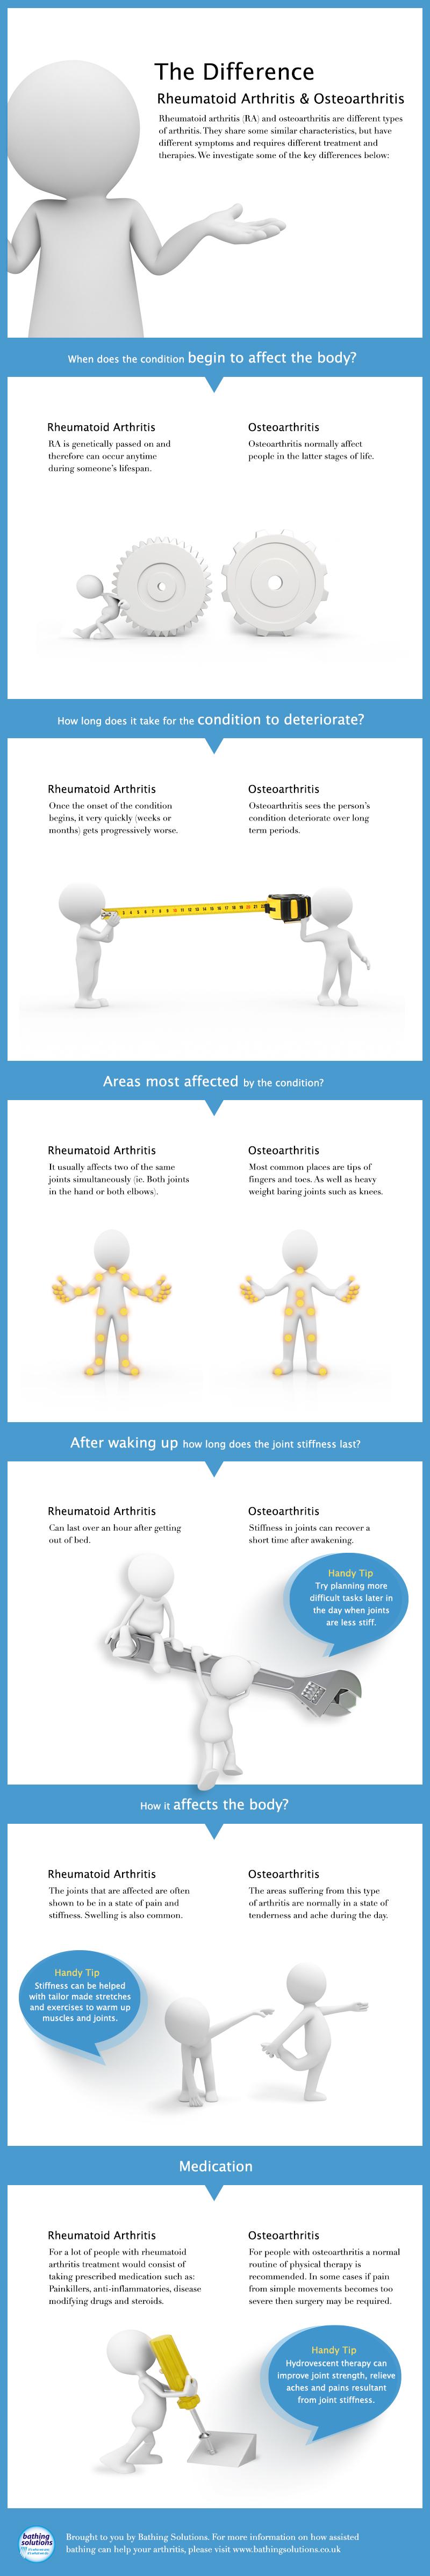 Infographic explaining differences between Rheumatoid Arthritis and Osteoarthritis